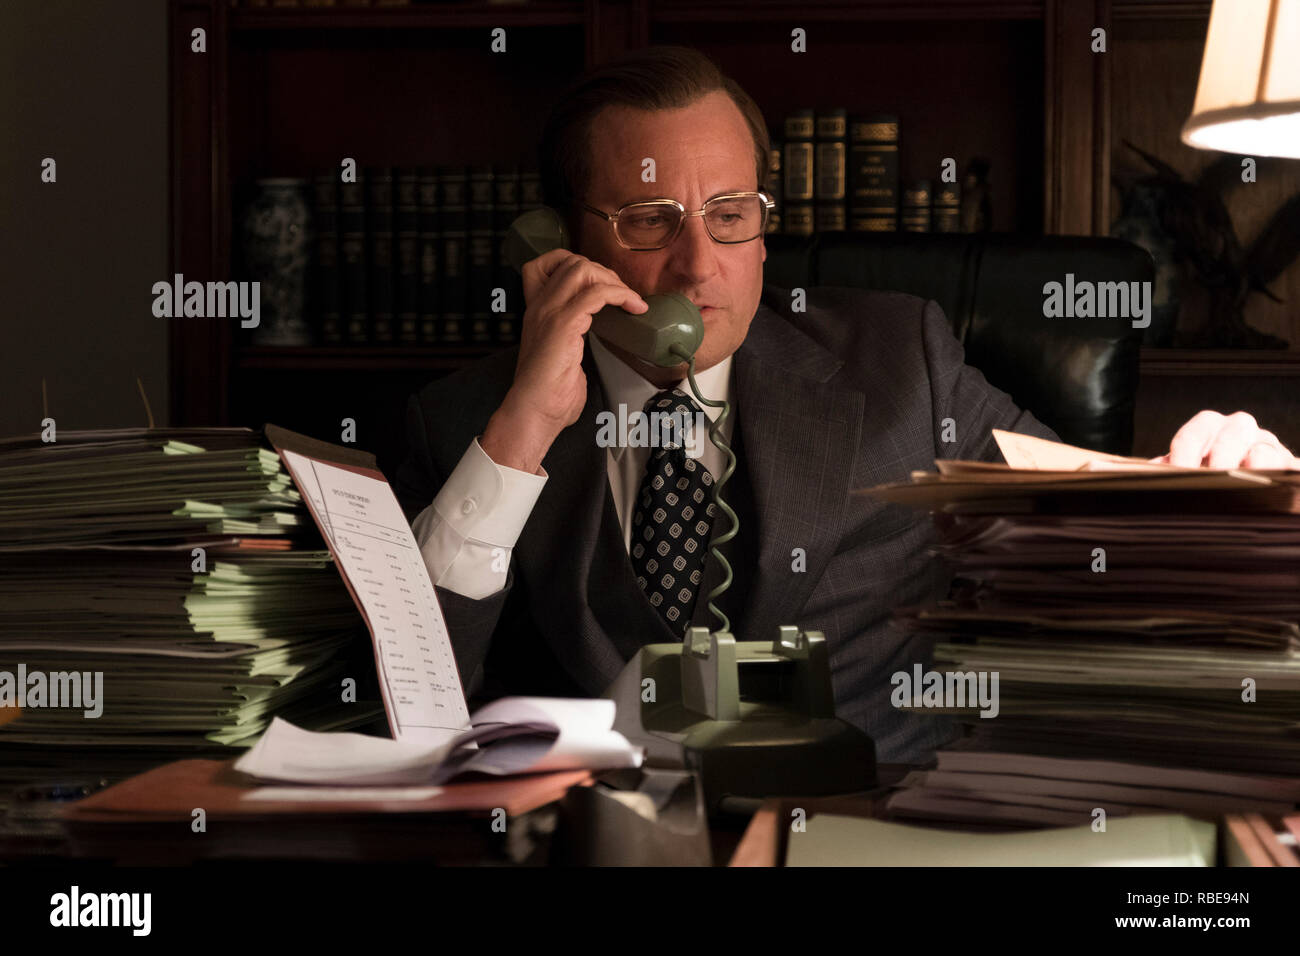 Prod DB © Matt Kennedy - Annapurna Pictures - Gary Sanchez Productions - Plan B Entertainment / DR VICE de Adam McKay 2018 USA Steve Carell. Donald Rumsfeld; biopic; biographie; biography; homme politique; politicien; politician - Stock Image